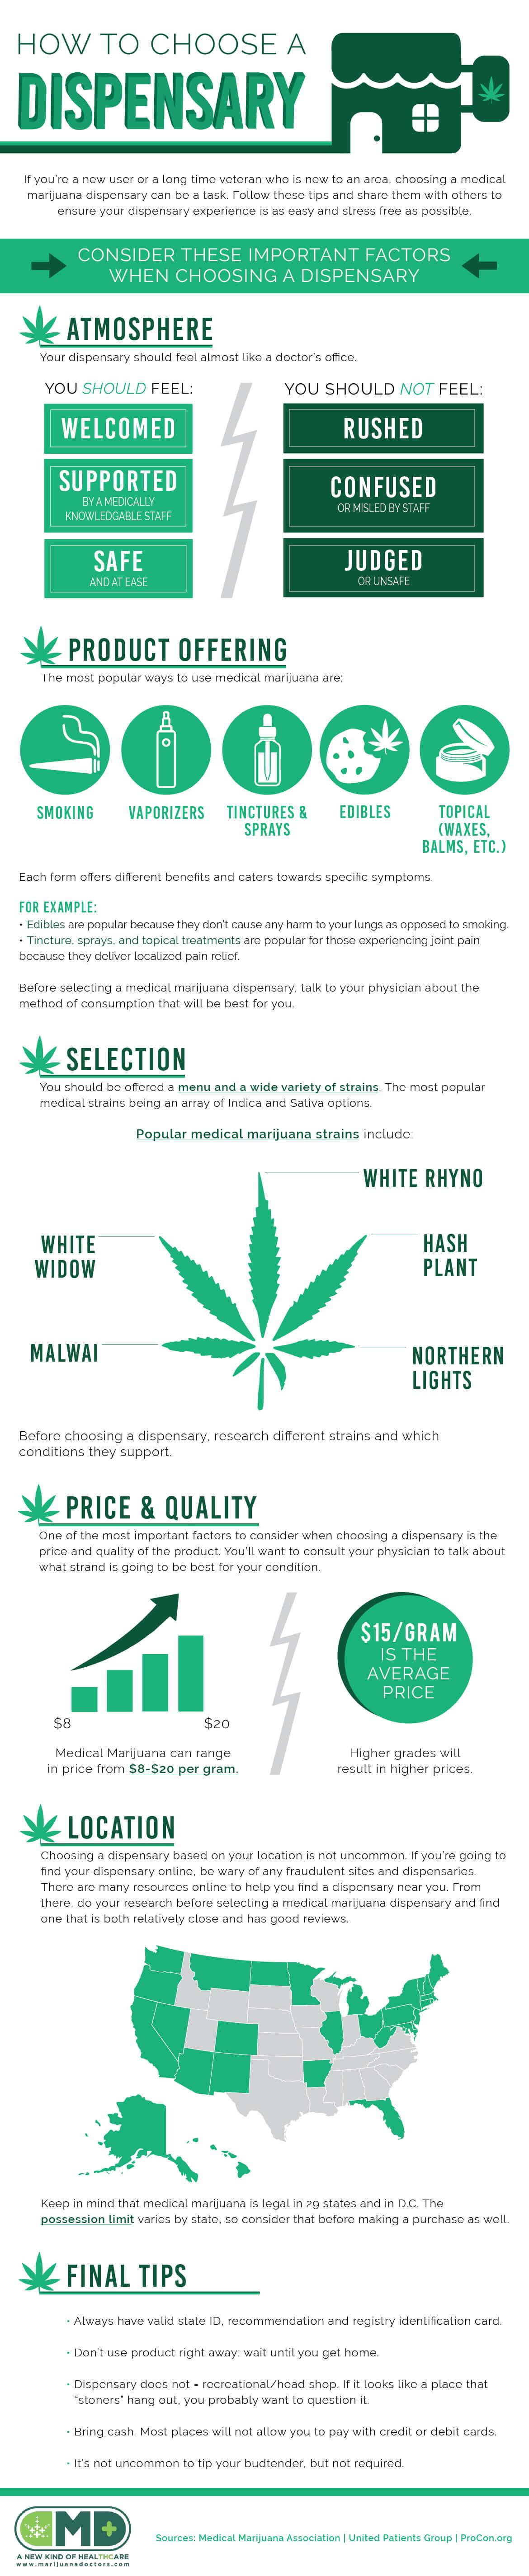 How to Choose a Dispensary | Marijuana Doctors